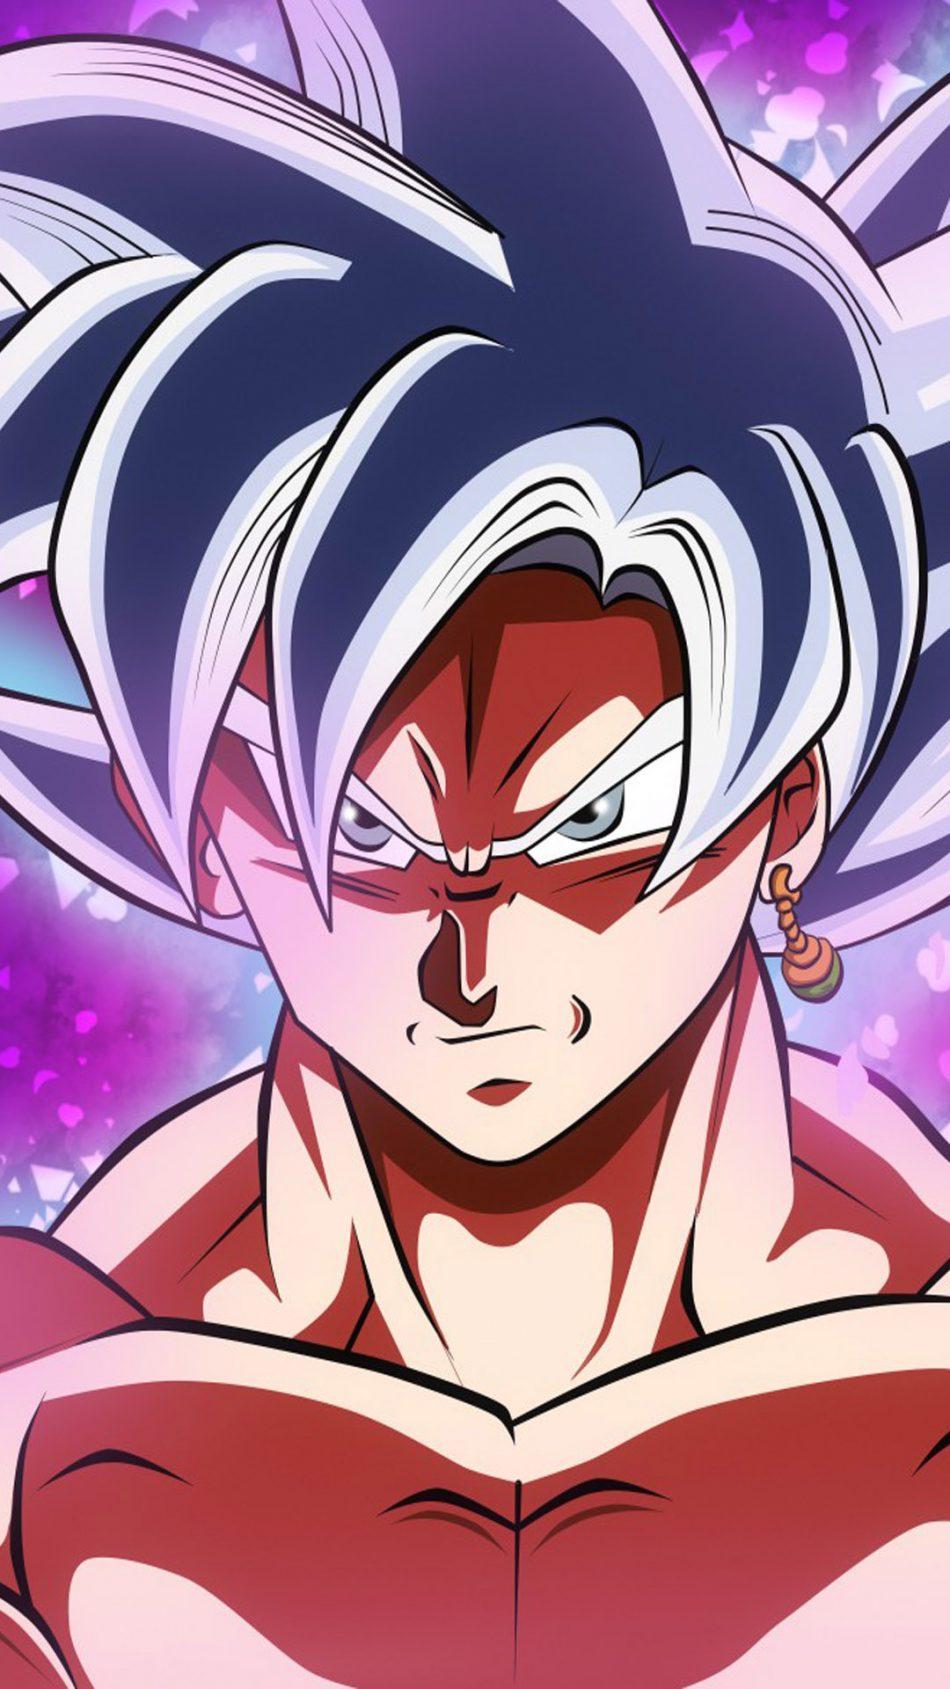 Goku Black Dragon Ball Super Hd Mobile Wallpaper Dragon Ball Super Wallpaper 4k Phone 891141 Hd Wallpaper Backgrounds Download